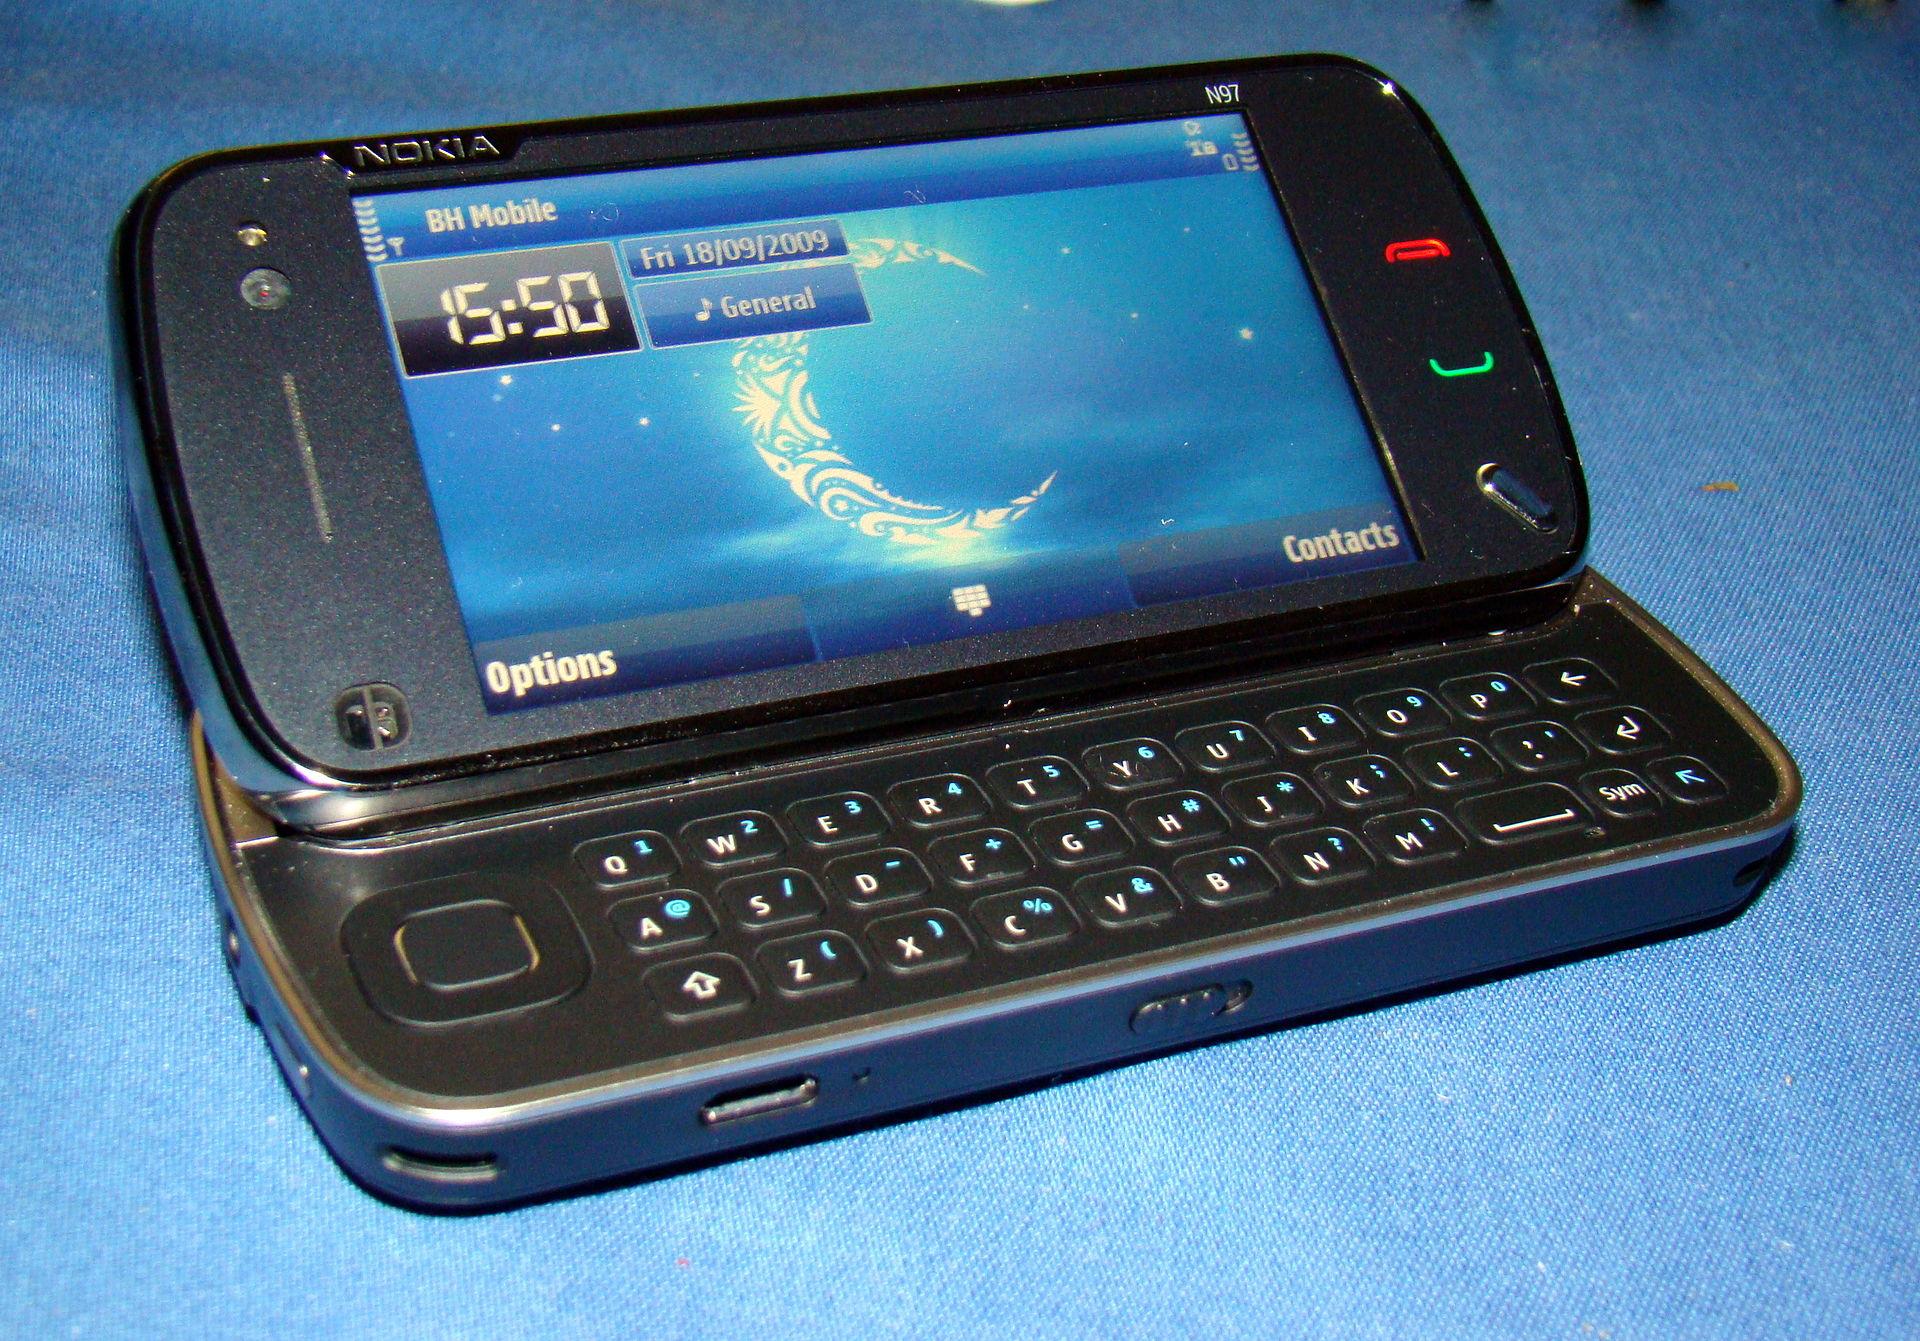 Nokia n97 wikipedia for Mobil wikipedia